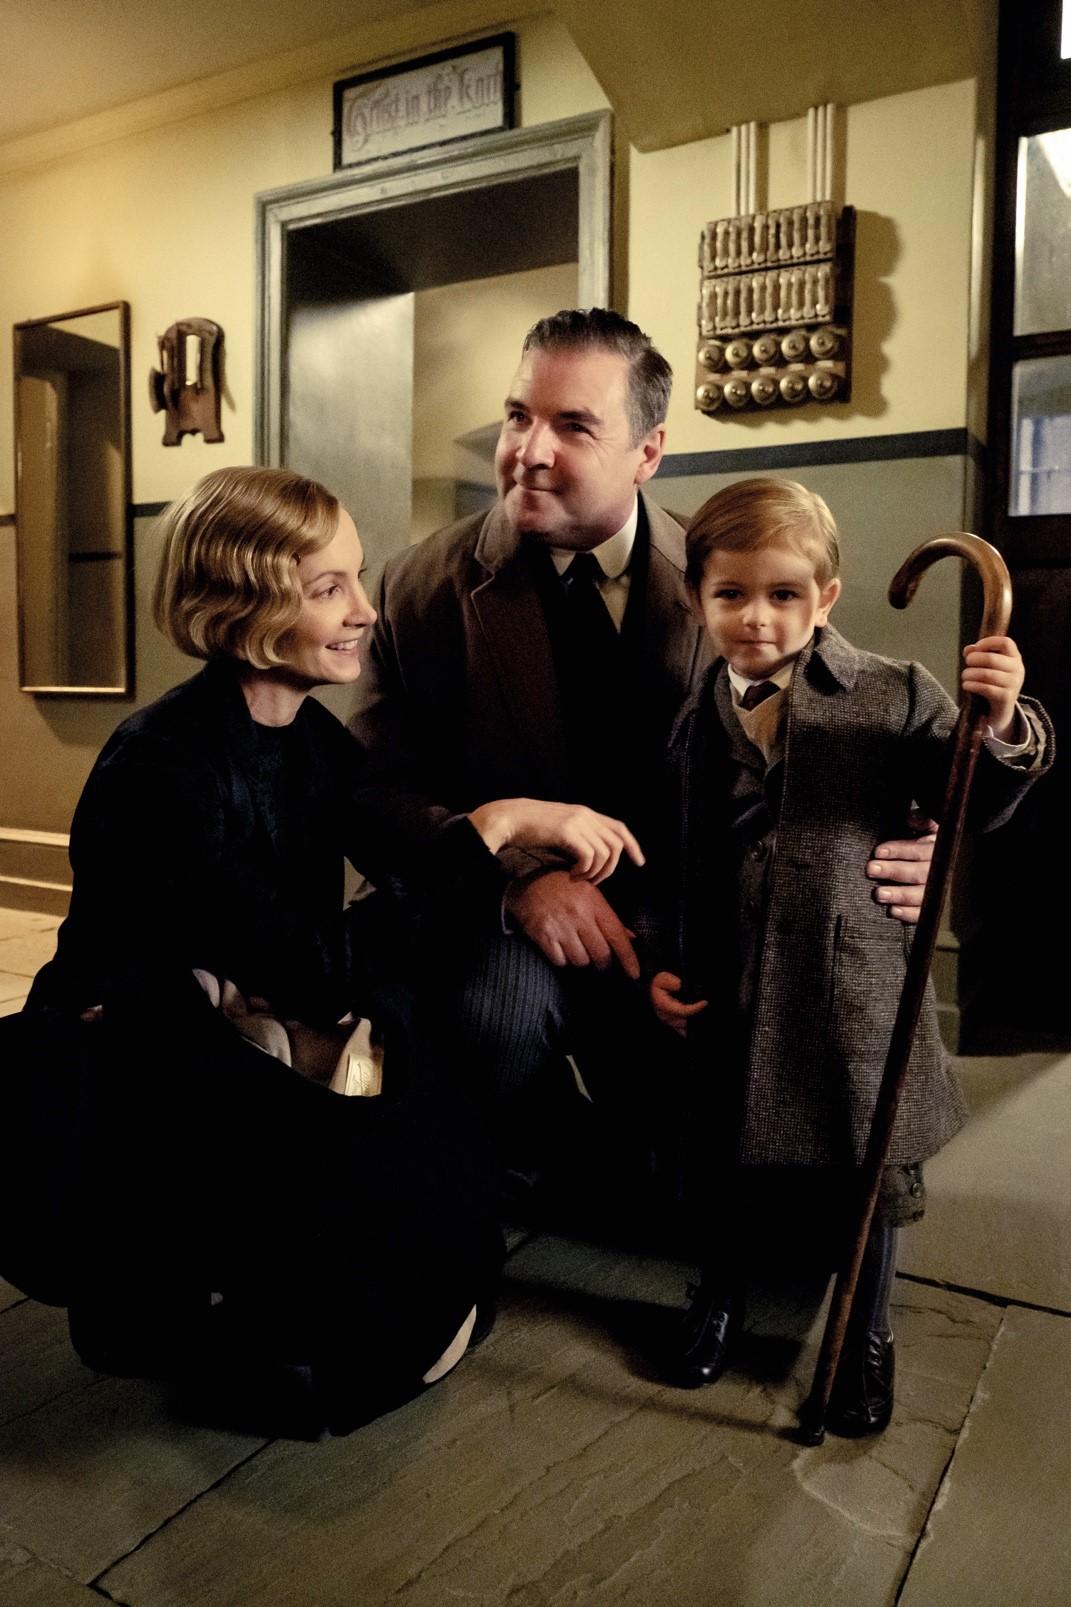 Dapper Downton Abbey suits hit the big screen Mr Bates